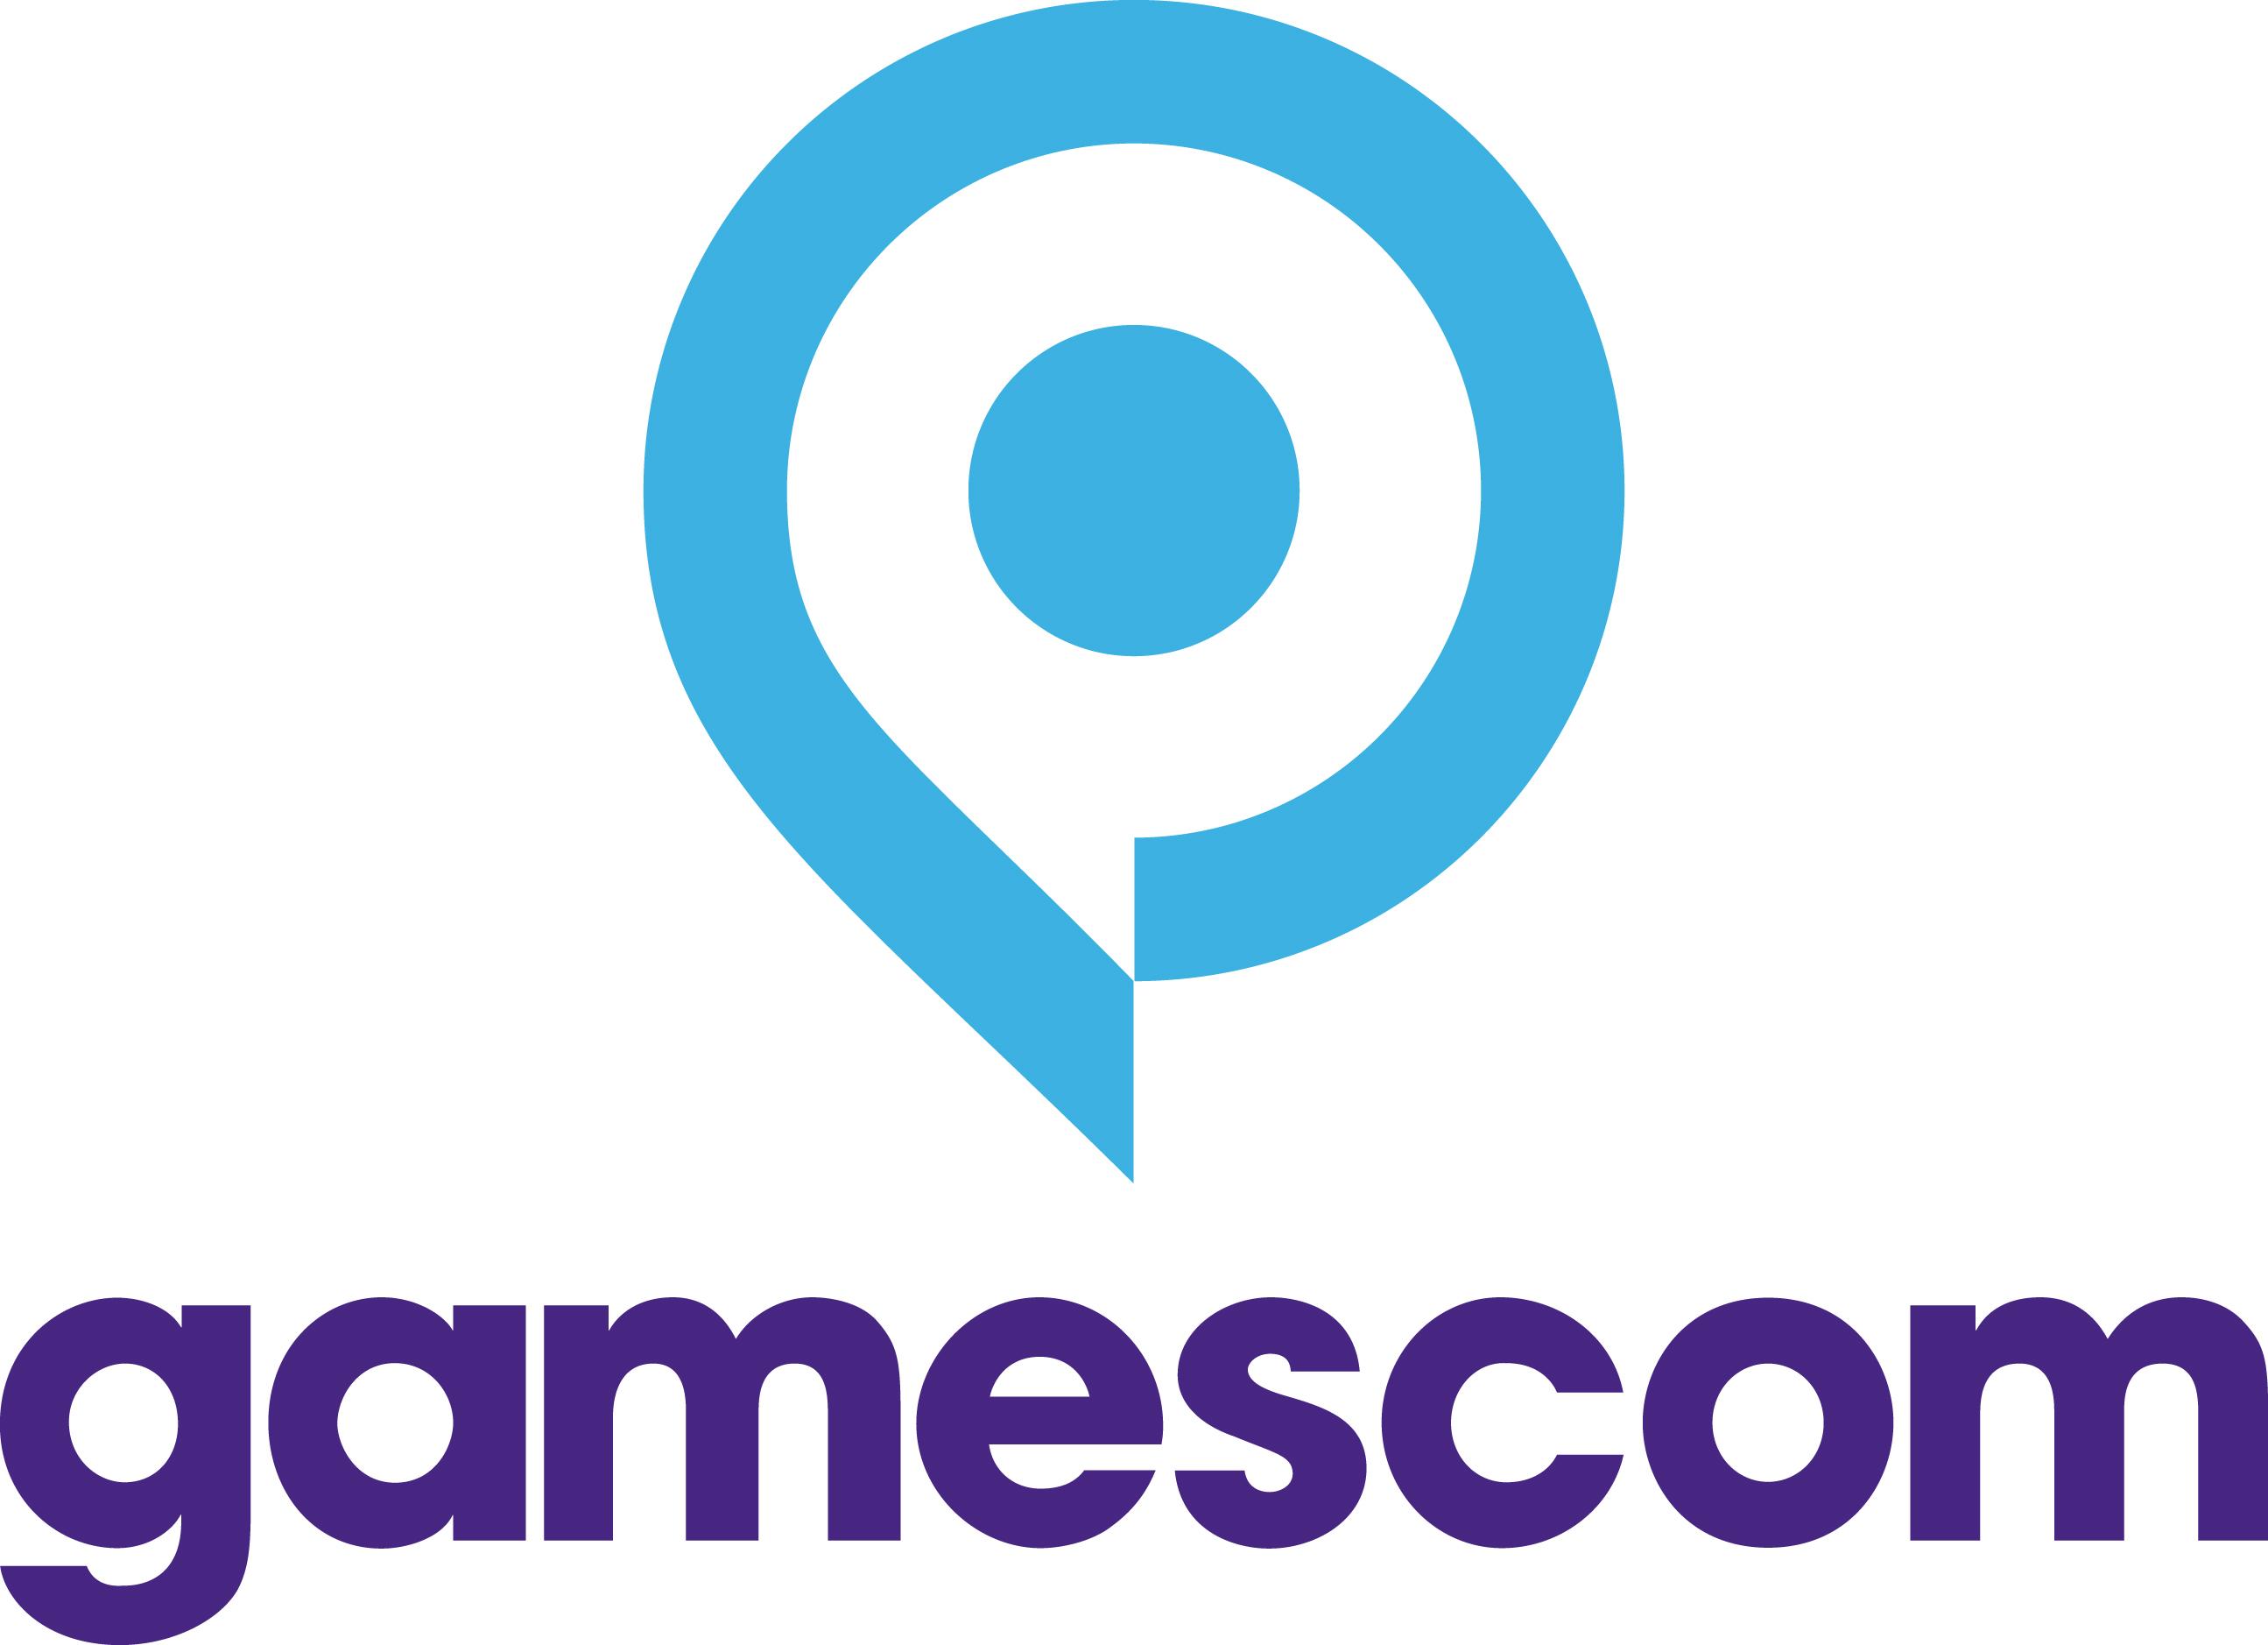 x_gamescom_Logo_A_RGB.jpg